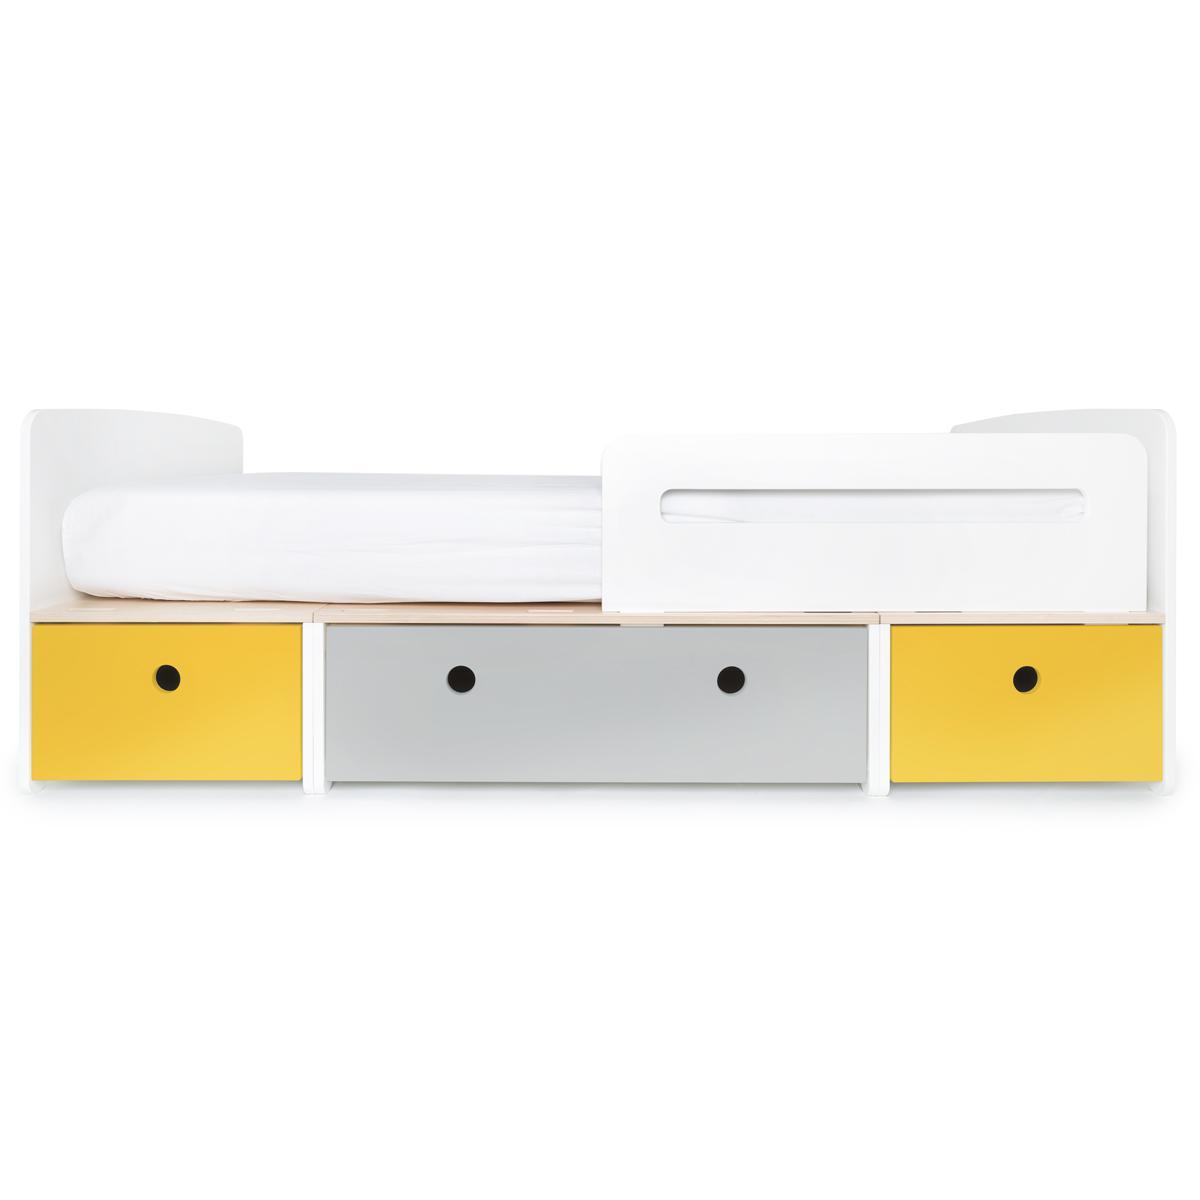 Lit évolutif 90x200cm COLORFLEX Abitare Kids nectar yellow-pearl grey-nectar yellow